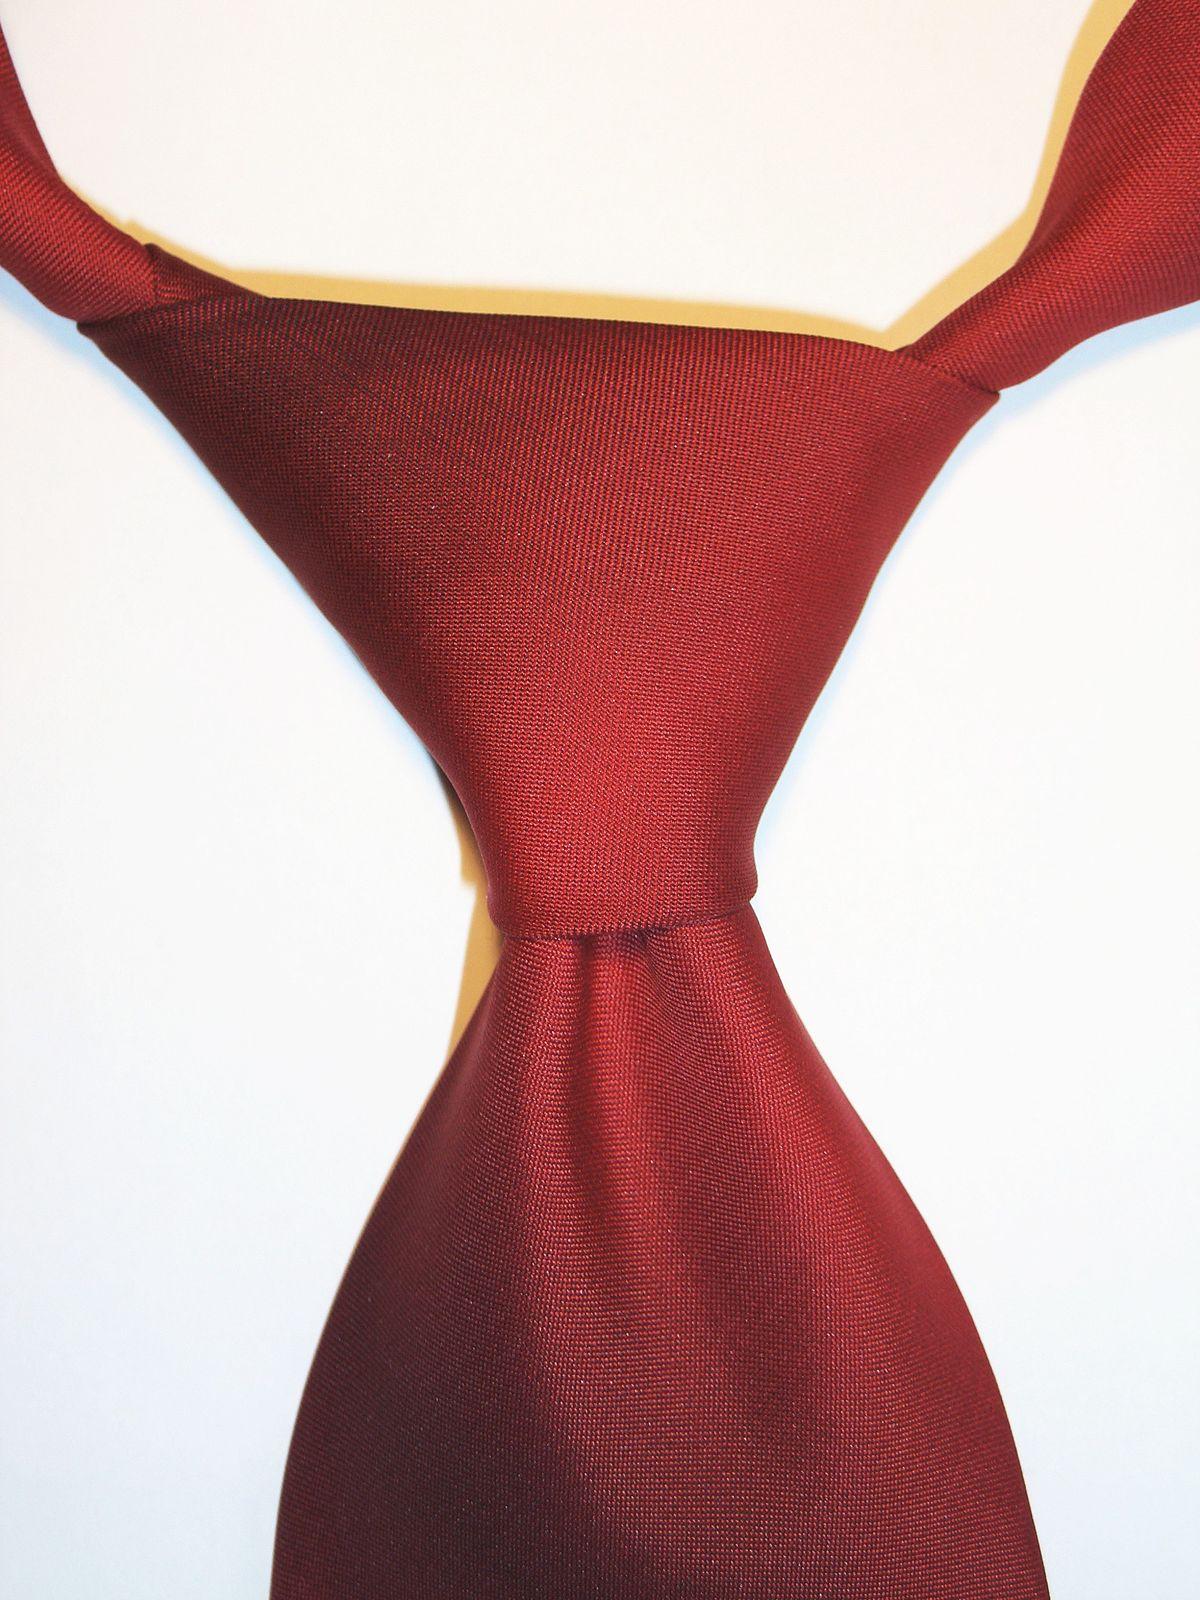 windsor knot wiktionary